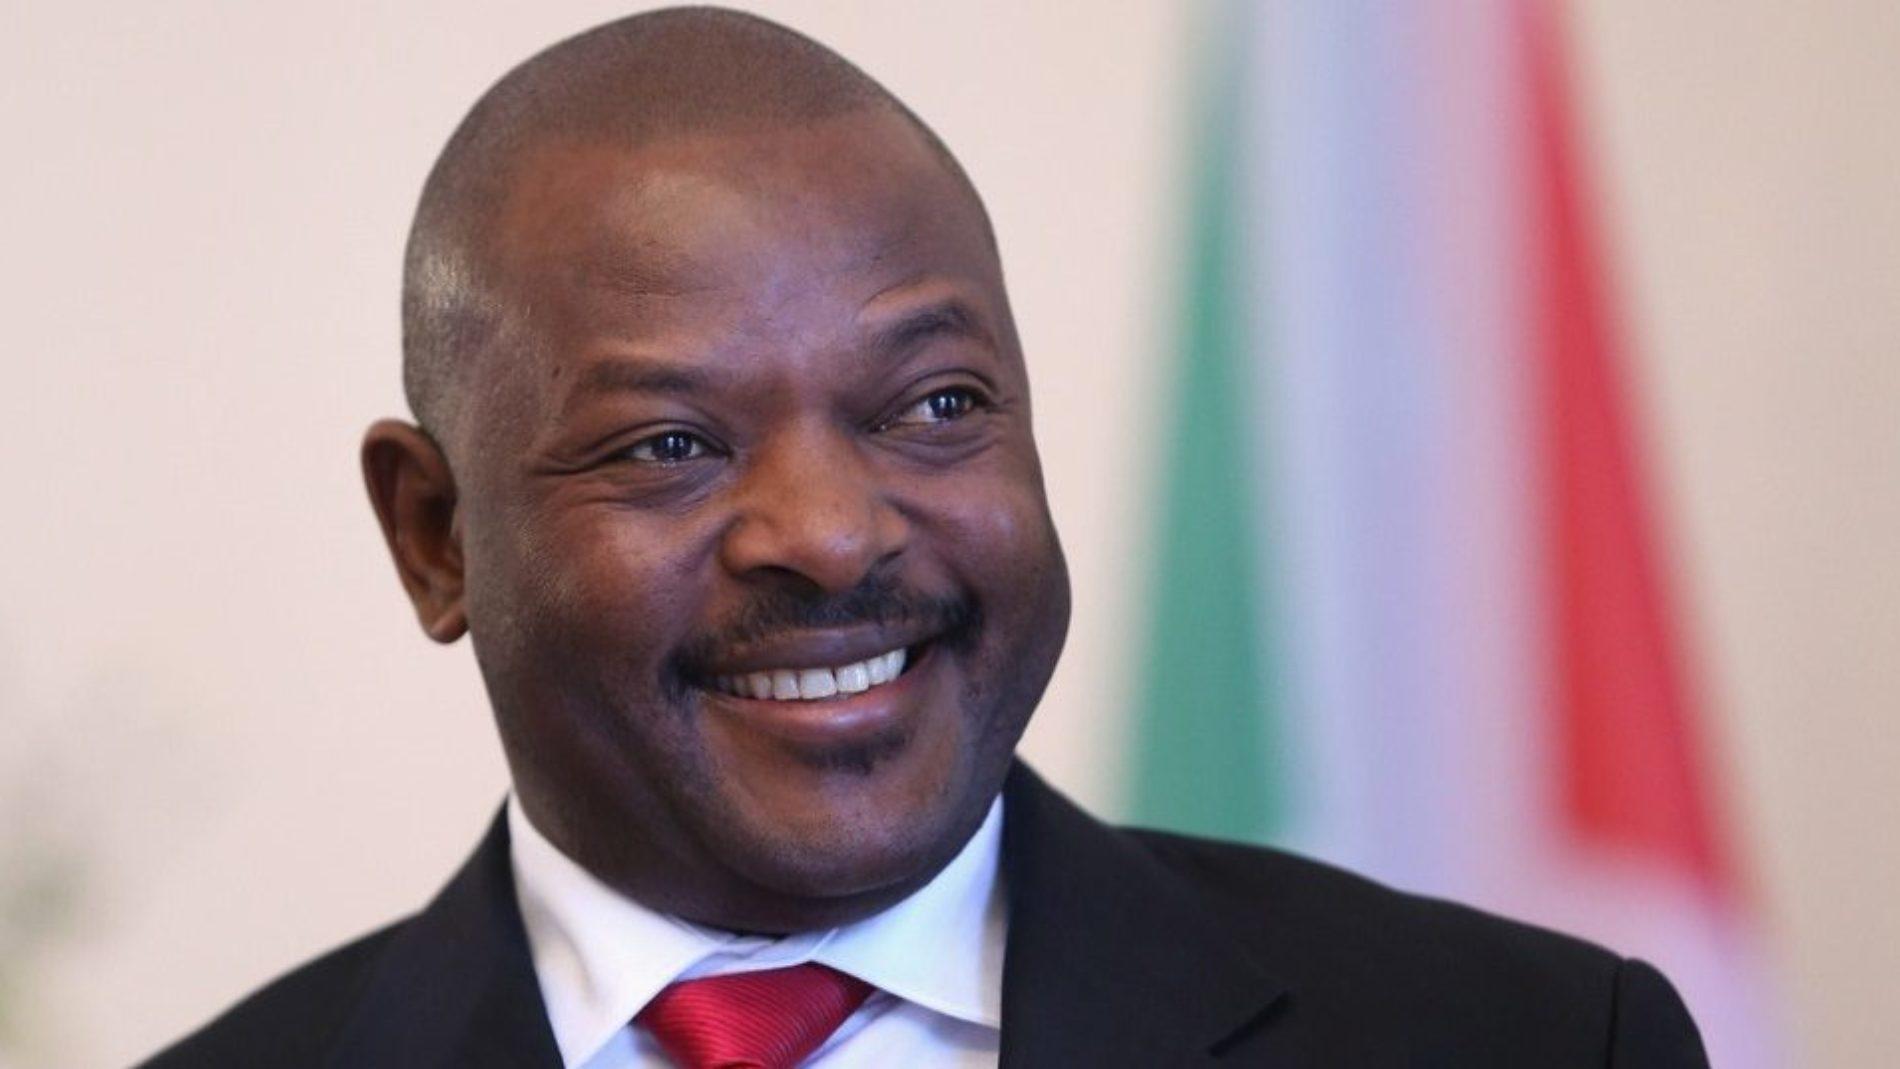 Le président Nkurunziza se félicite d'un Burundi prospère